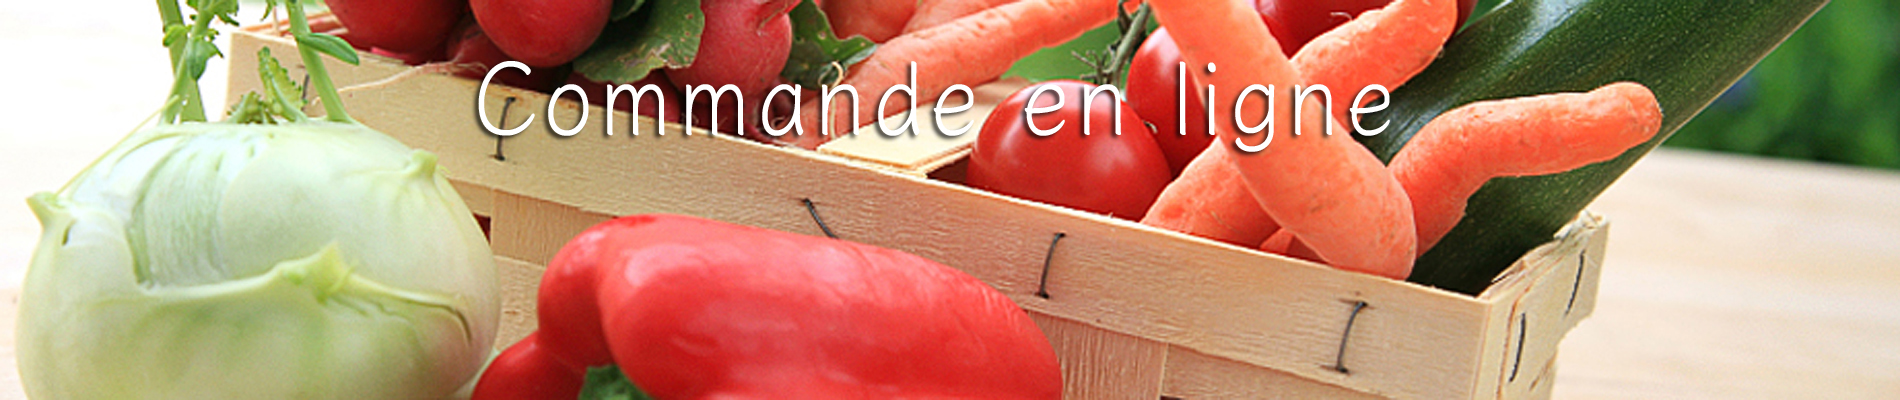 Légumes_iStock_000015252203_1900x400_Titre